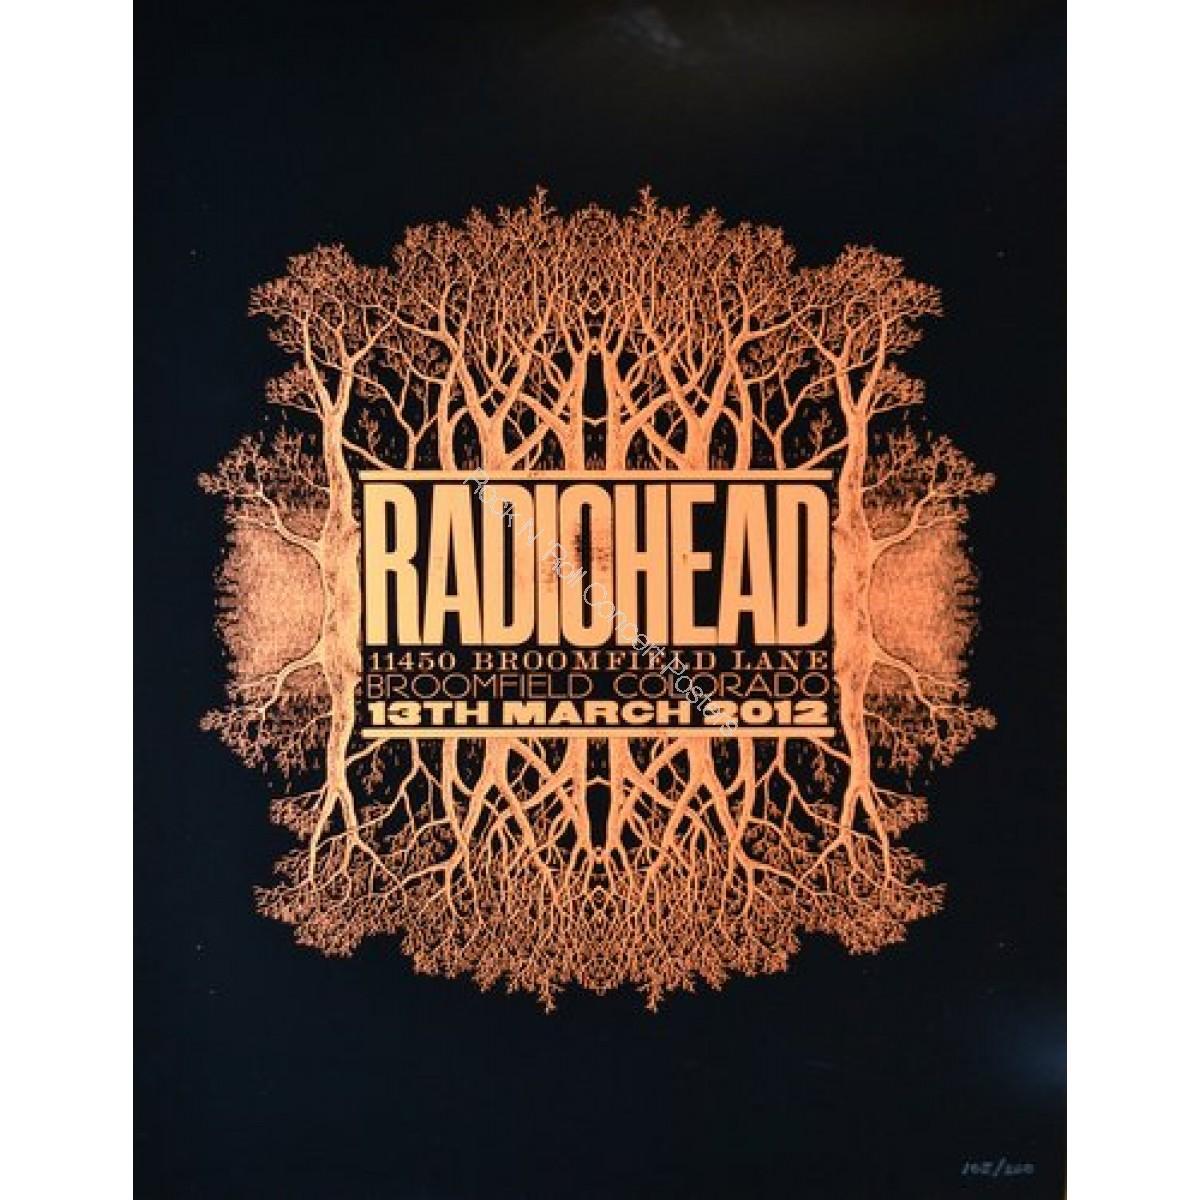 Radiohead March 13th 2012 Broomfield Colorado official print